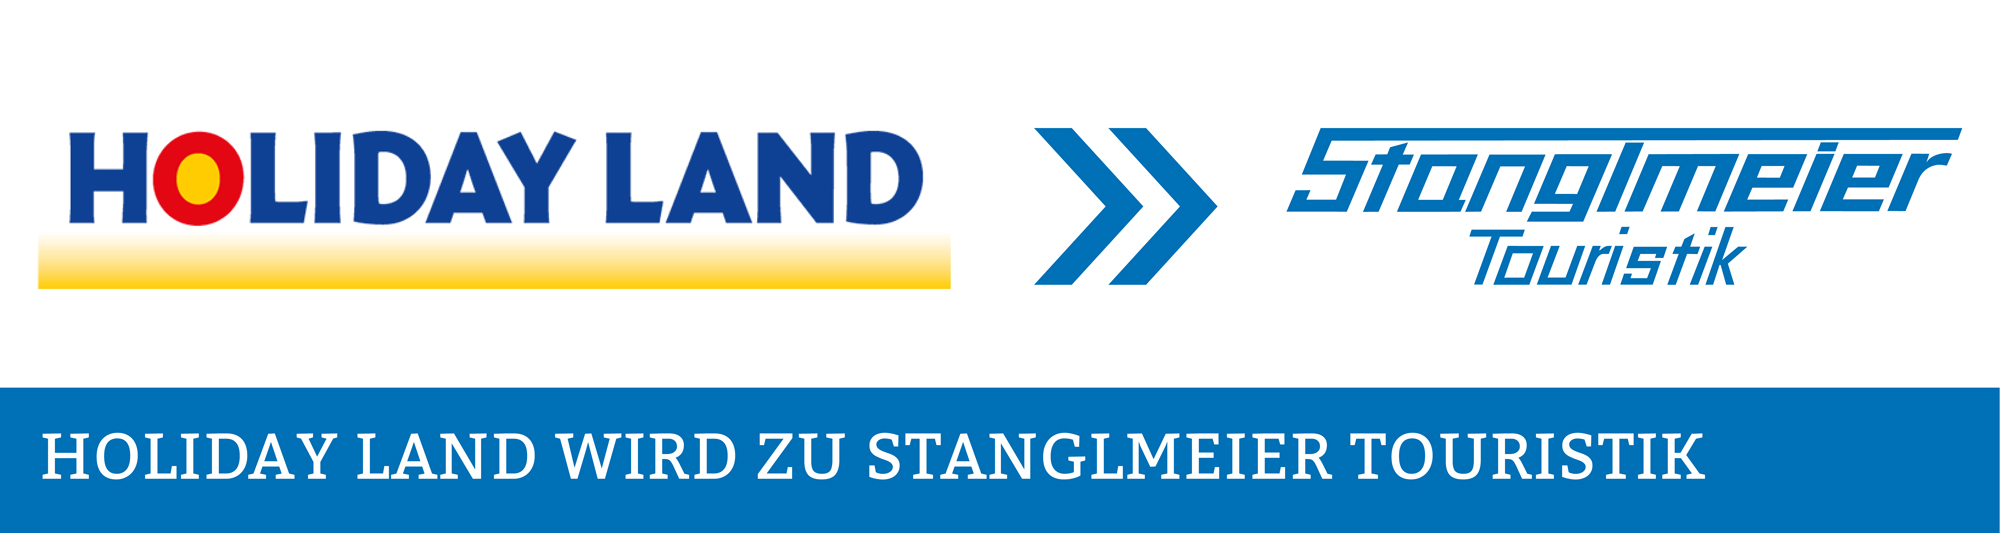 Holiday Land - Stanglmeier